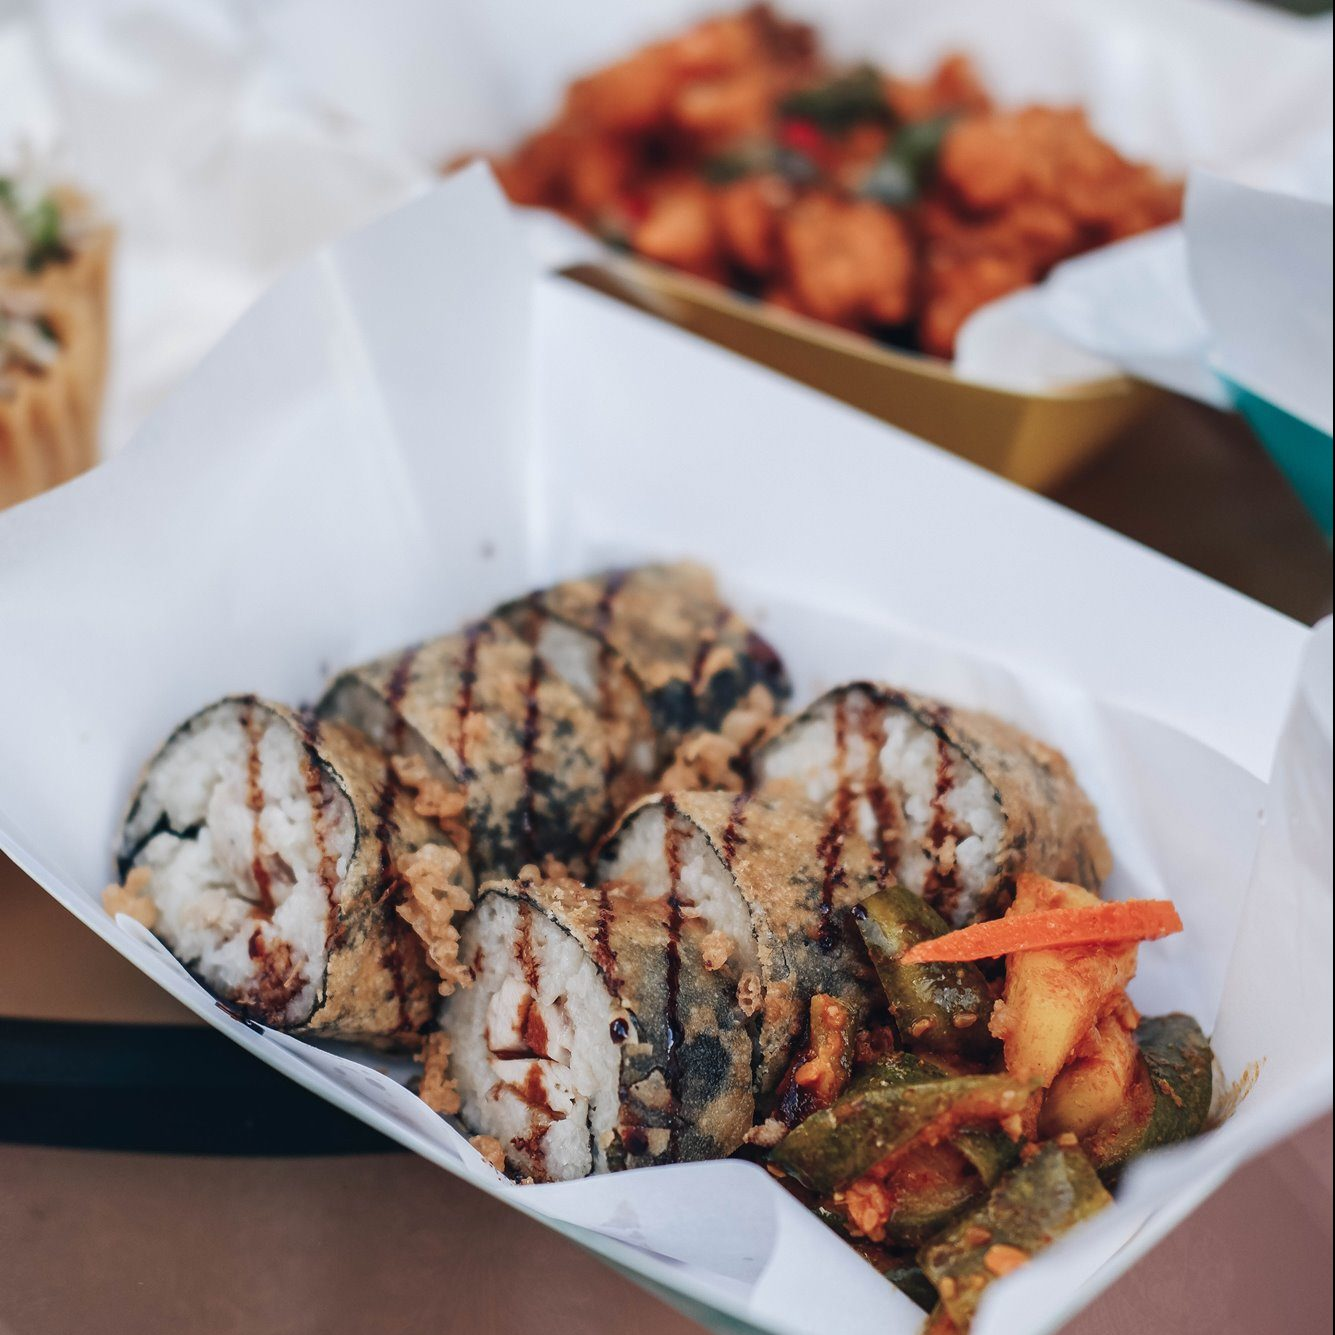 The Chicken's Rollin' - Bugis Café - Outdoor Beers and Delights @ Studio M Hotel Singapore